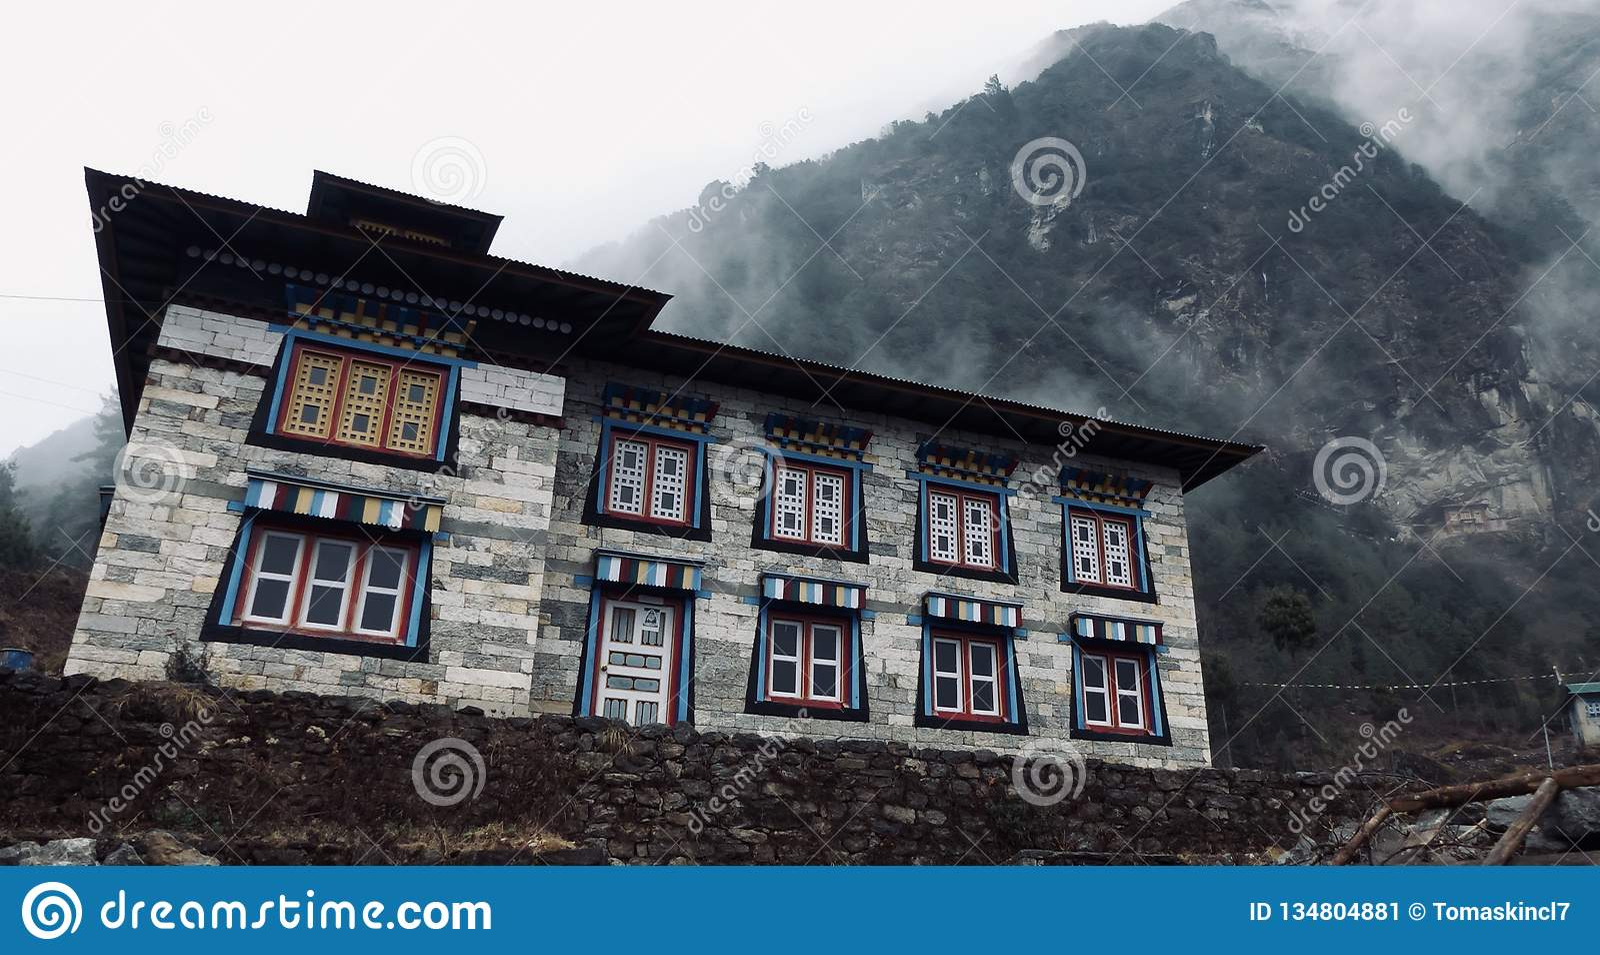 Il Nepal, bei monumenti storici, modo a Everest